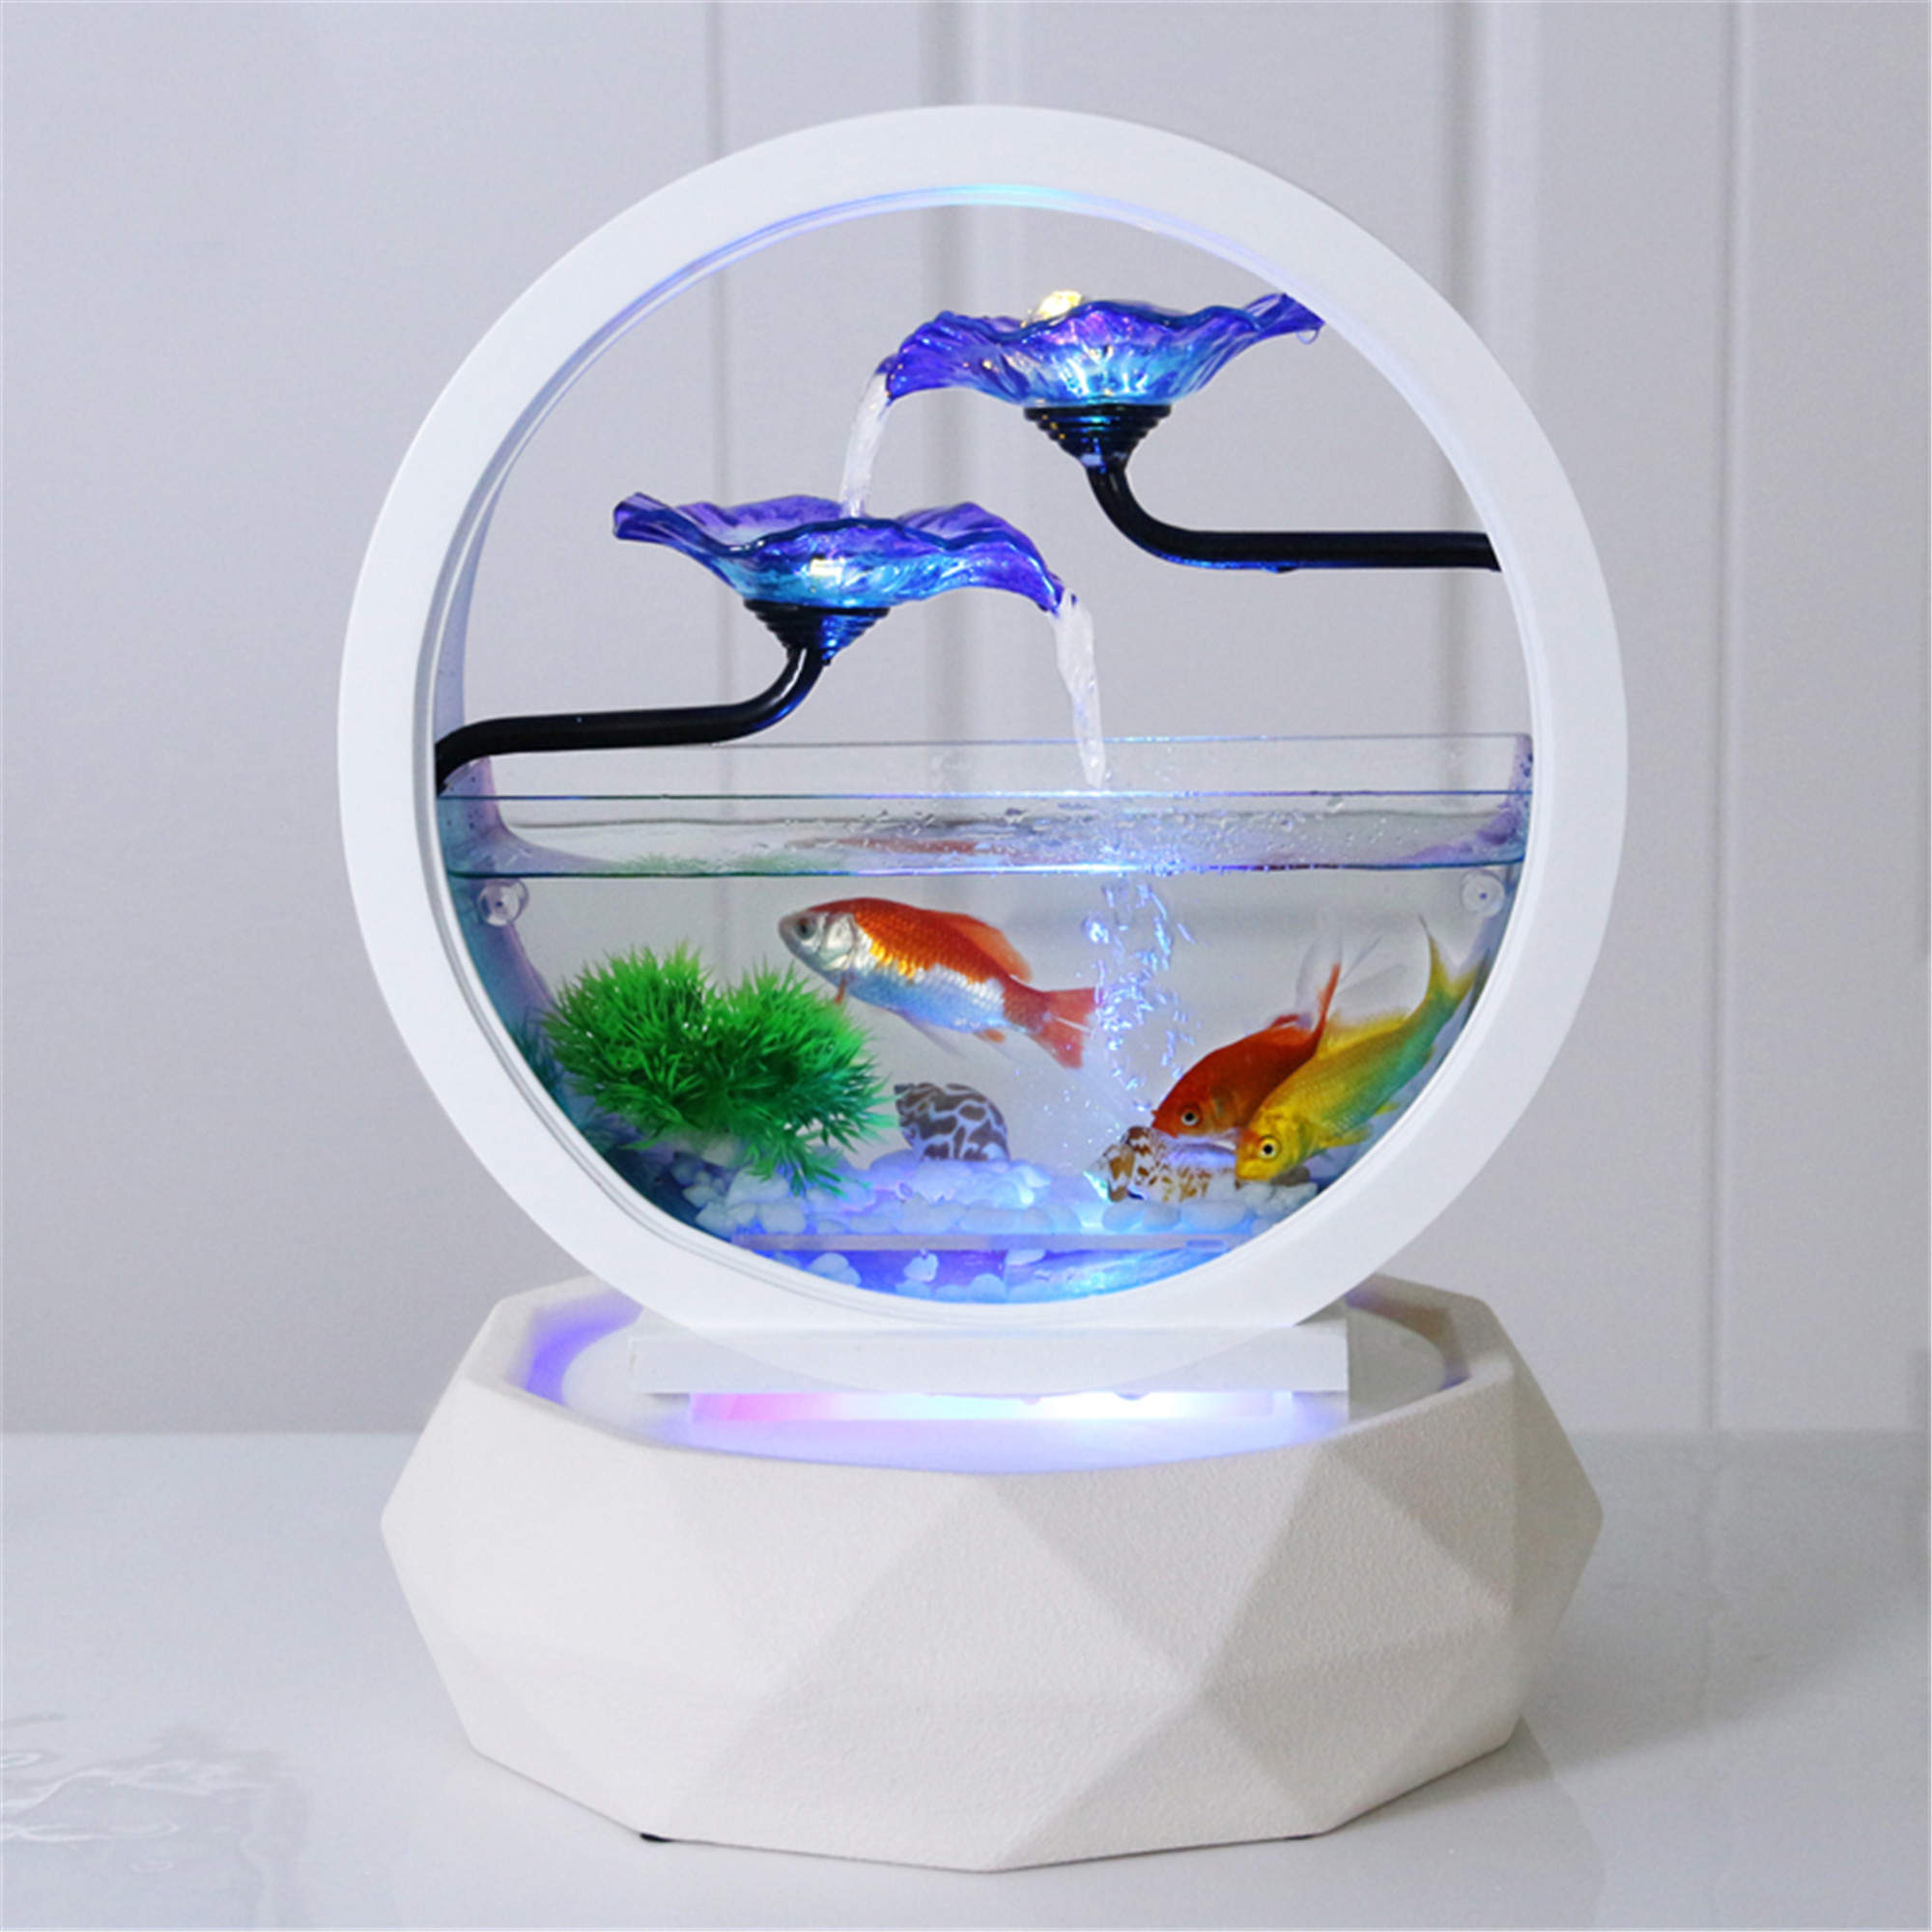 Desktop Water Fountain Small Fish Tank Creativity Table Top Round White Glass Aquarium Office Indoor Decoration Waterfall Kit